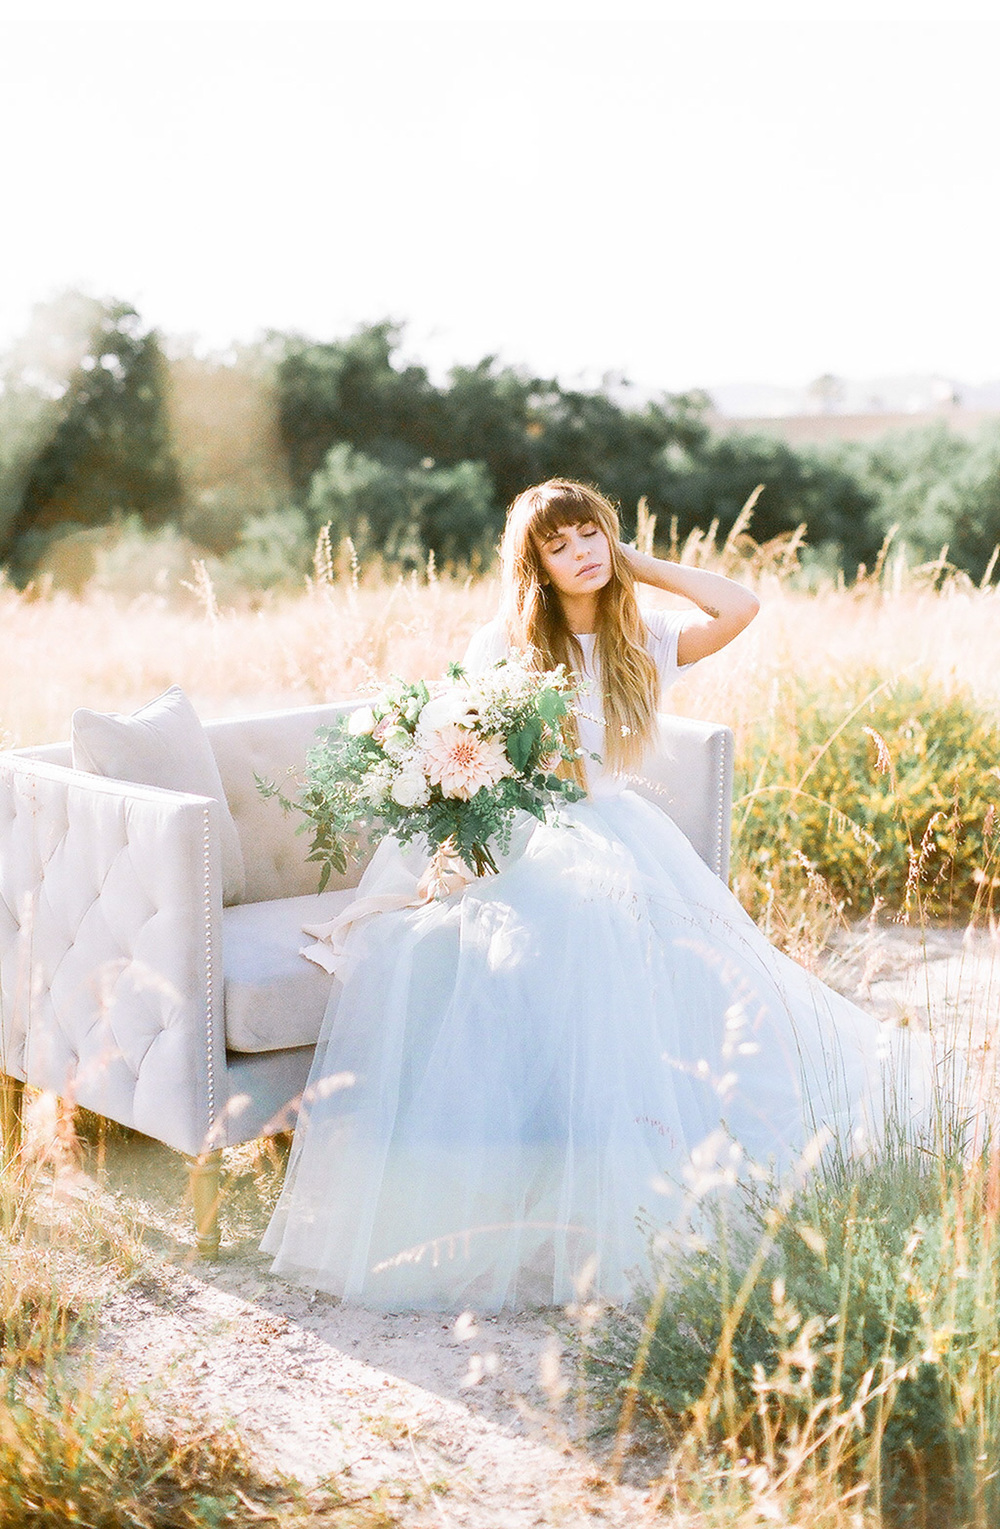 Natalie-Schutt-Photography-Santa-Barbara-Wedding-Photographer-Southern-California-Bride_01.jpg